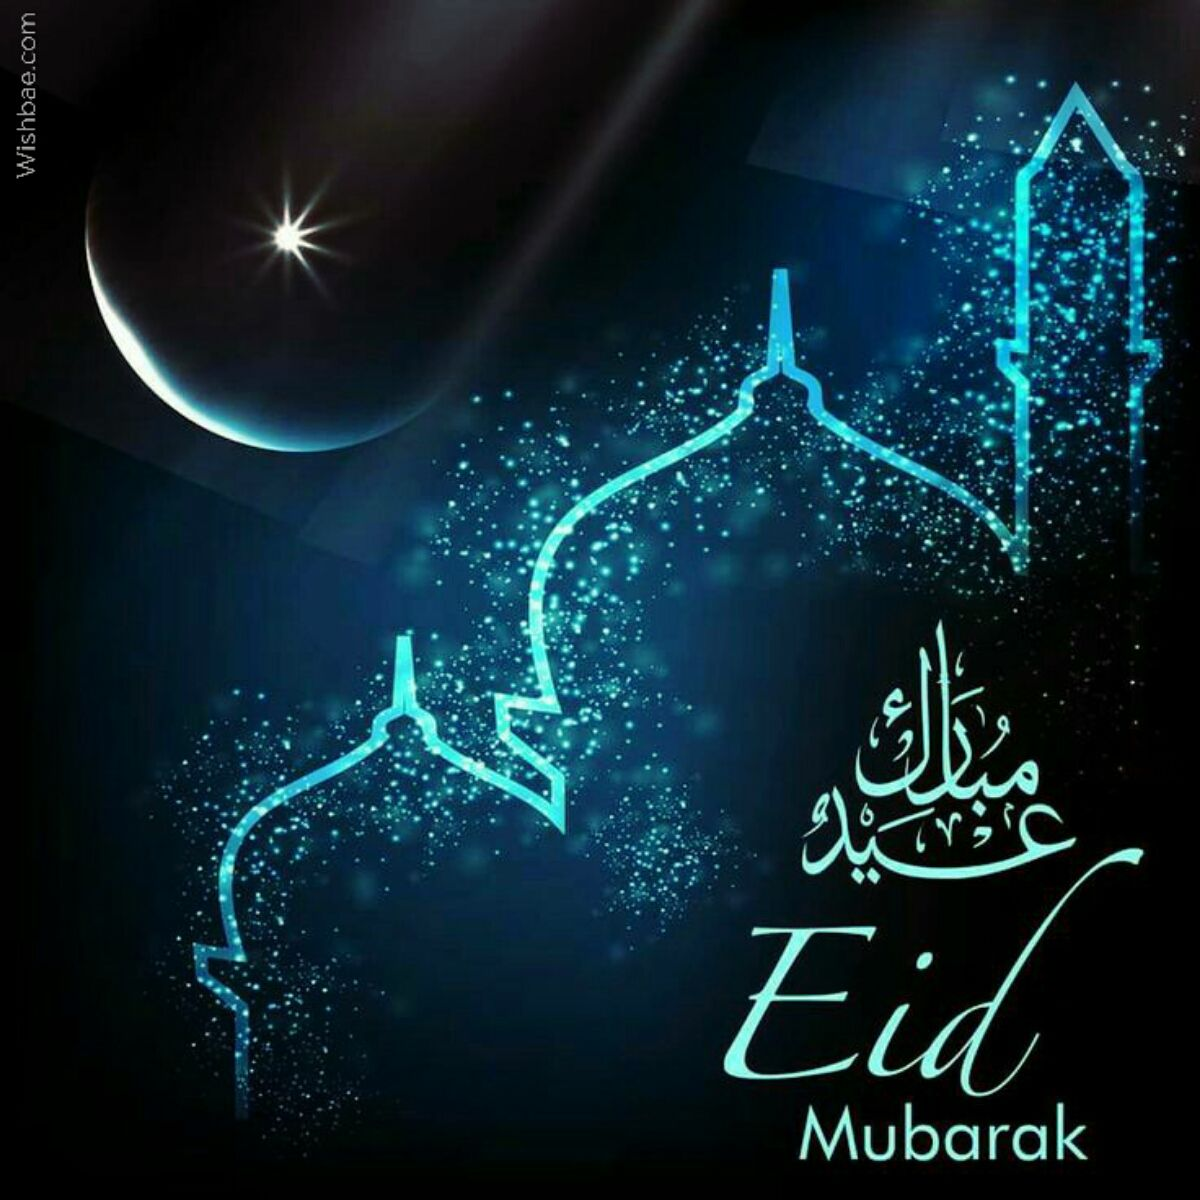 Eid Mubarak Wishes Happy Eid Al Fitr Quotes Messages Images Eid Mubarak Wishes Eid Mubarak Wallpaper Eid Mubarak Images